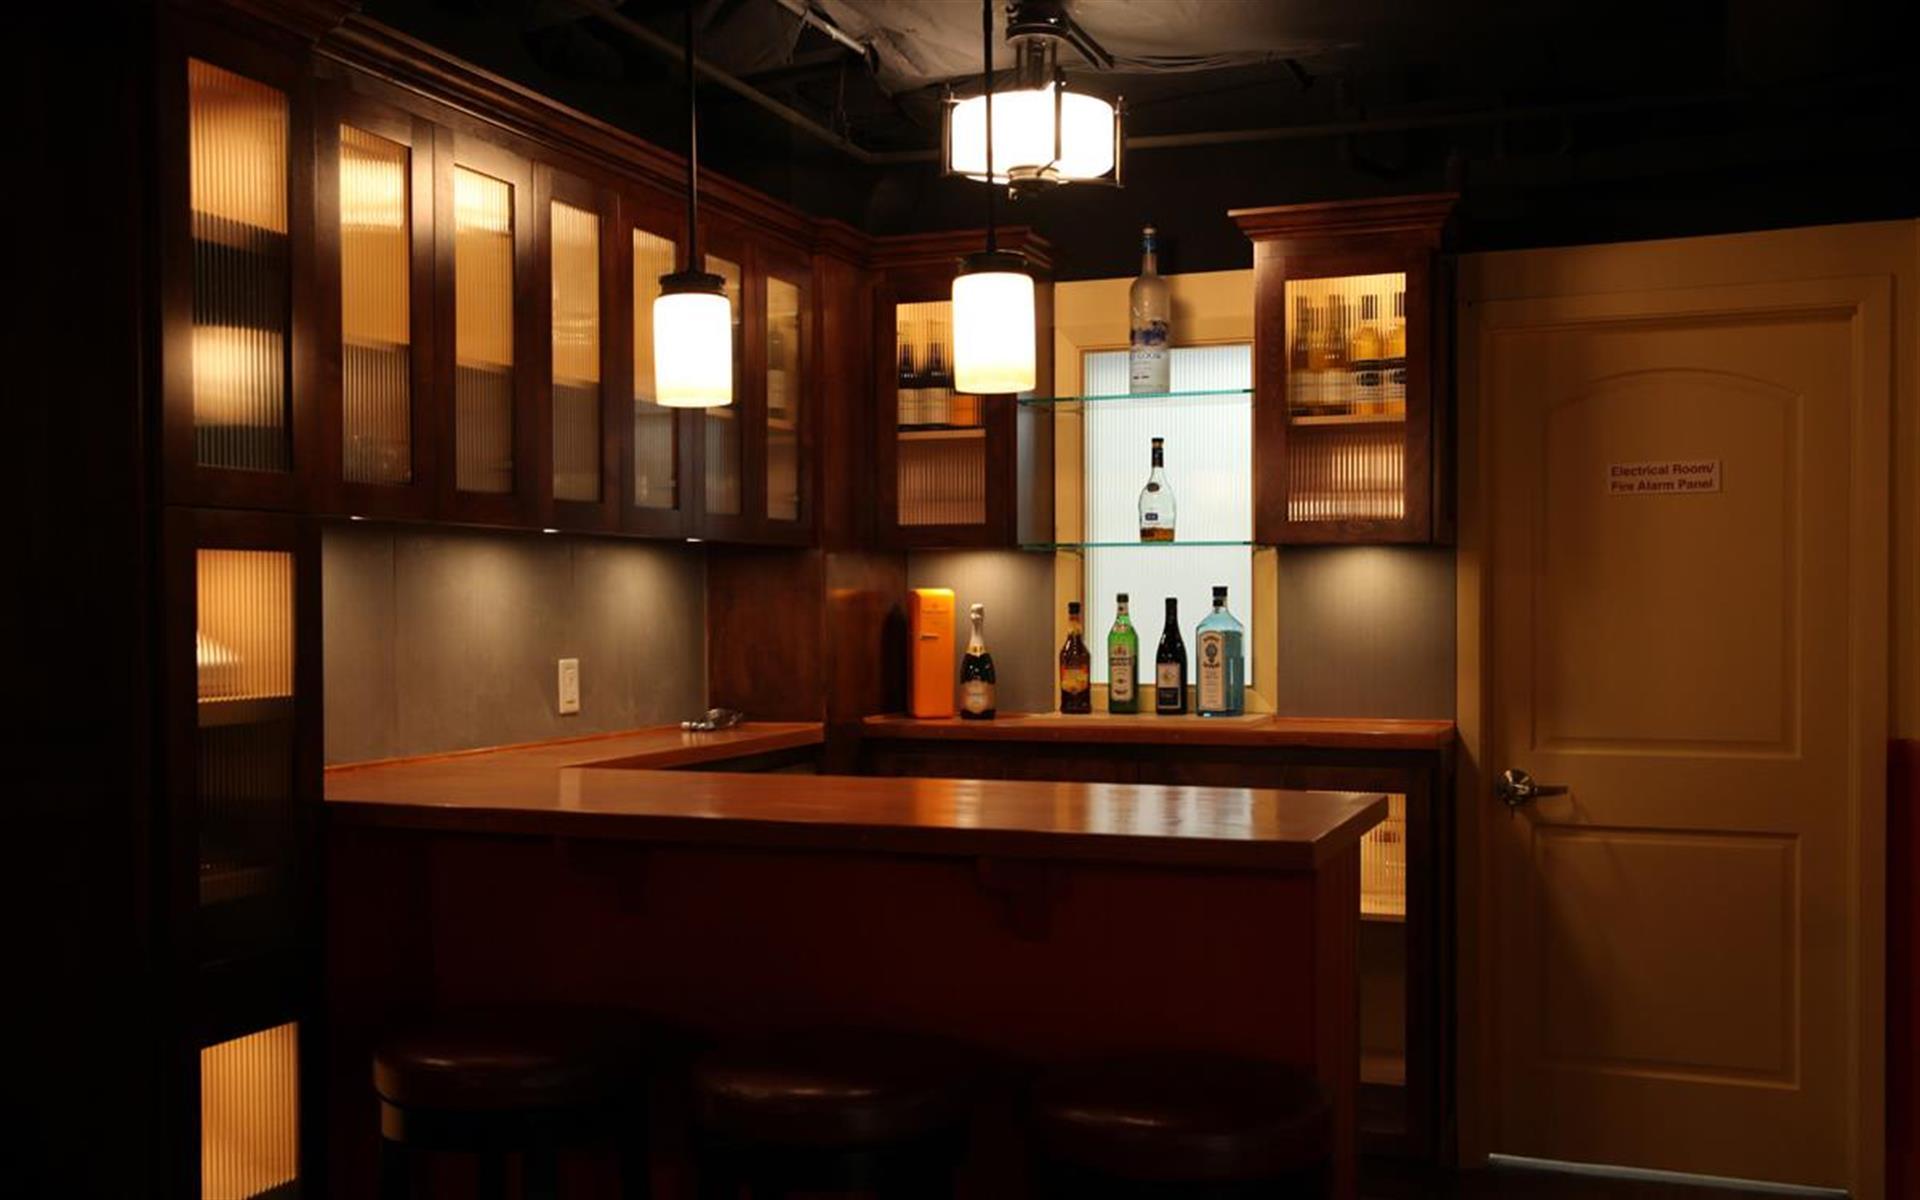 Club Sportiva - Cigar Lounge